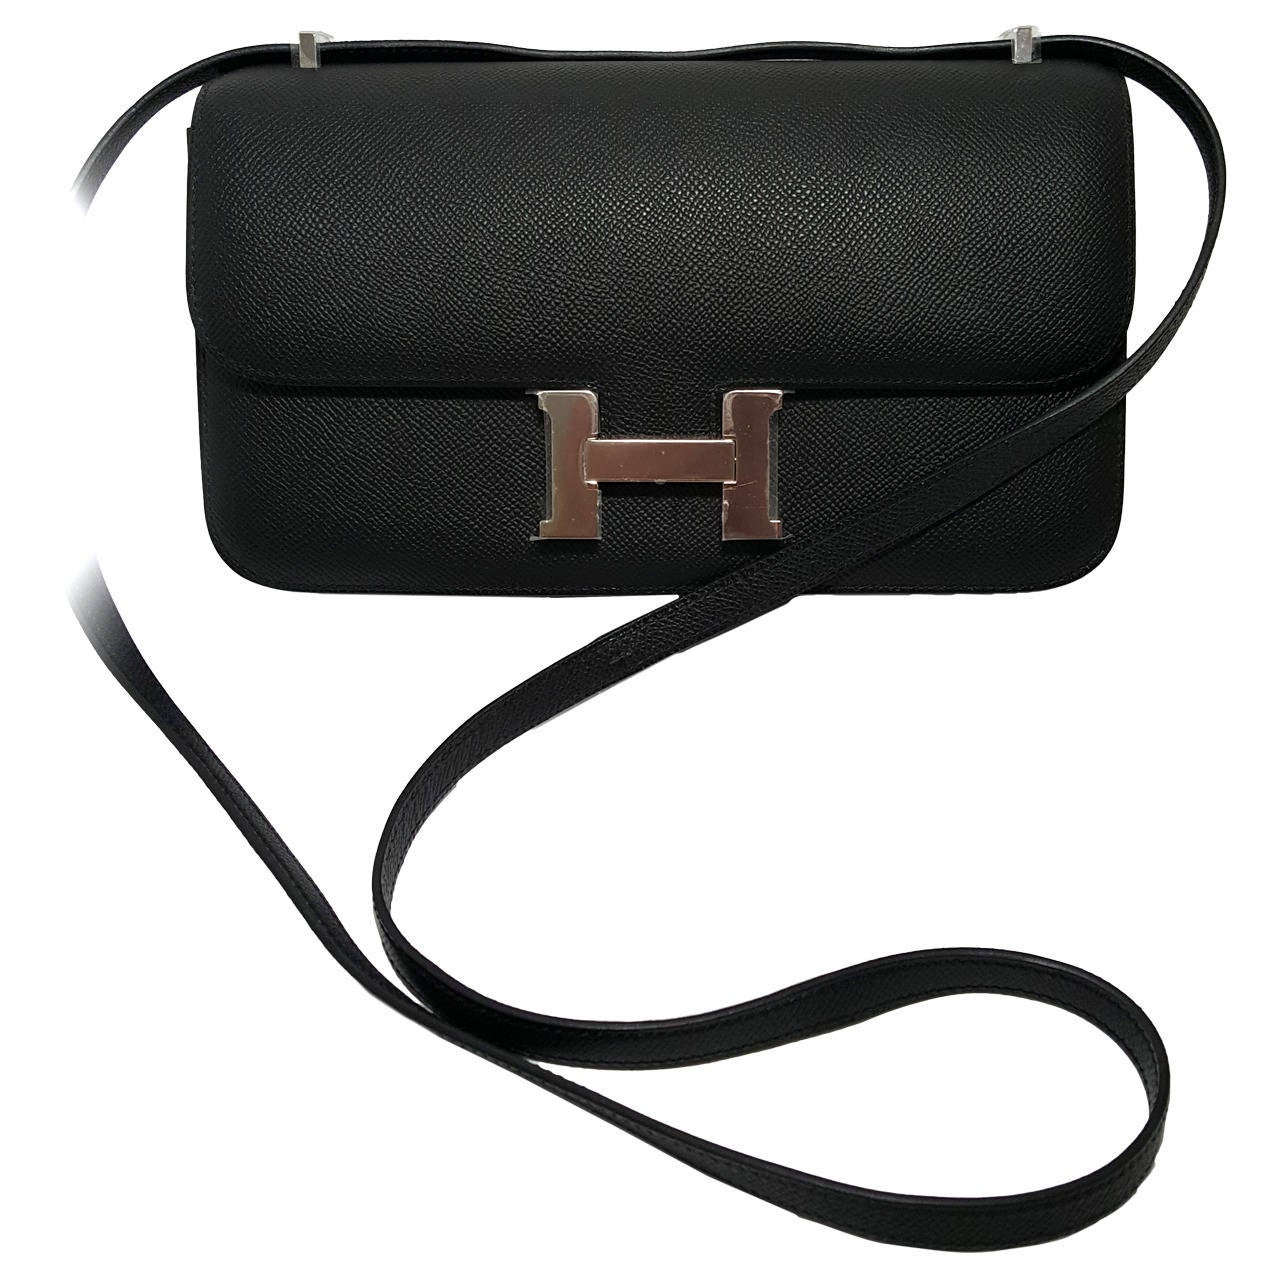 Hermes Constance Elan Epsom With Palladium Hardware Bag